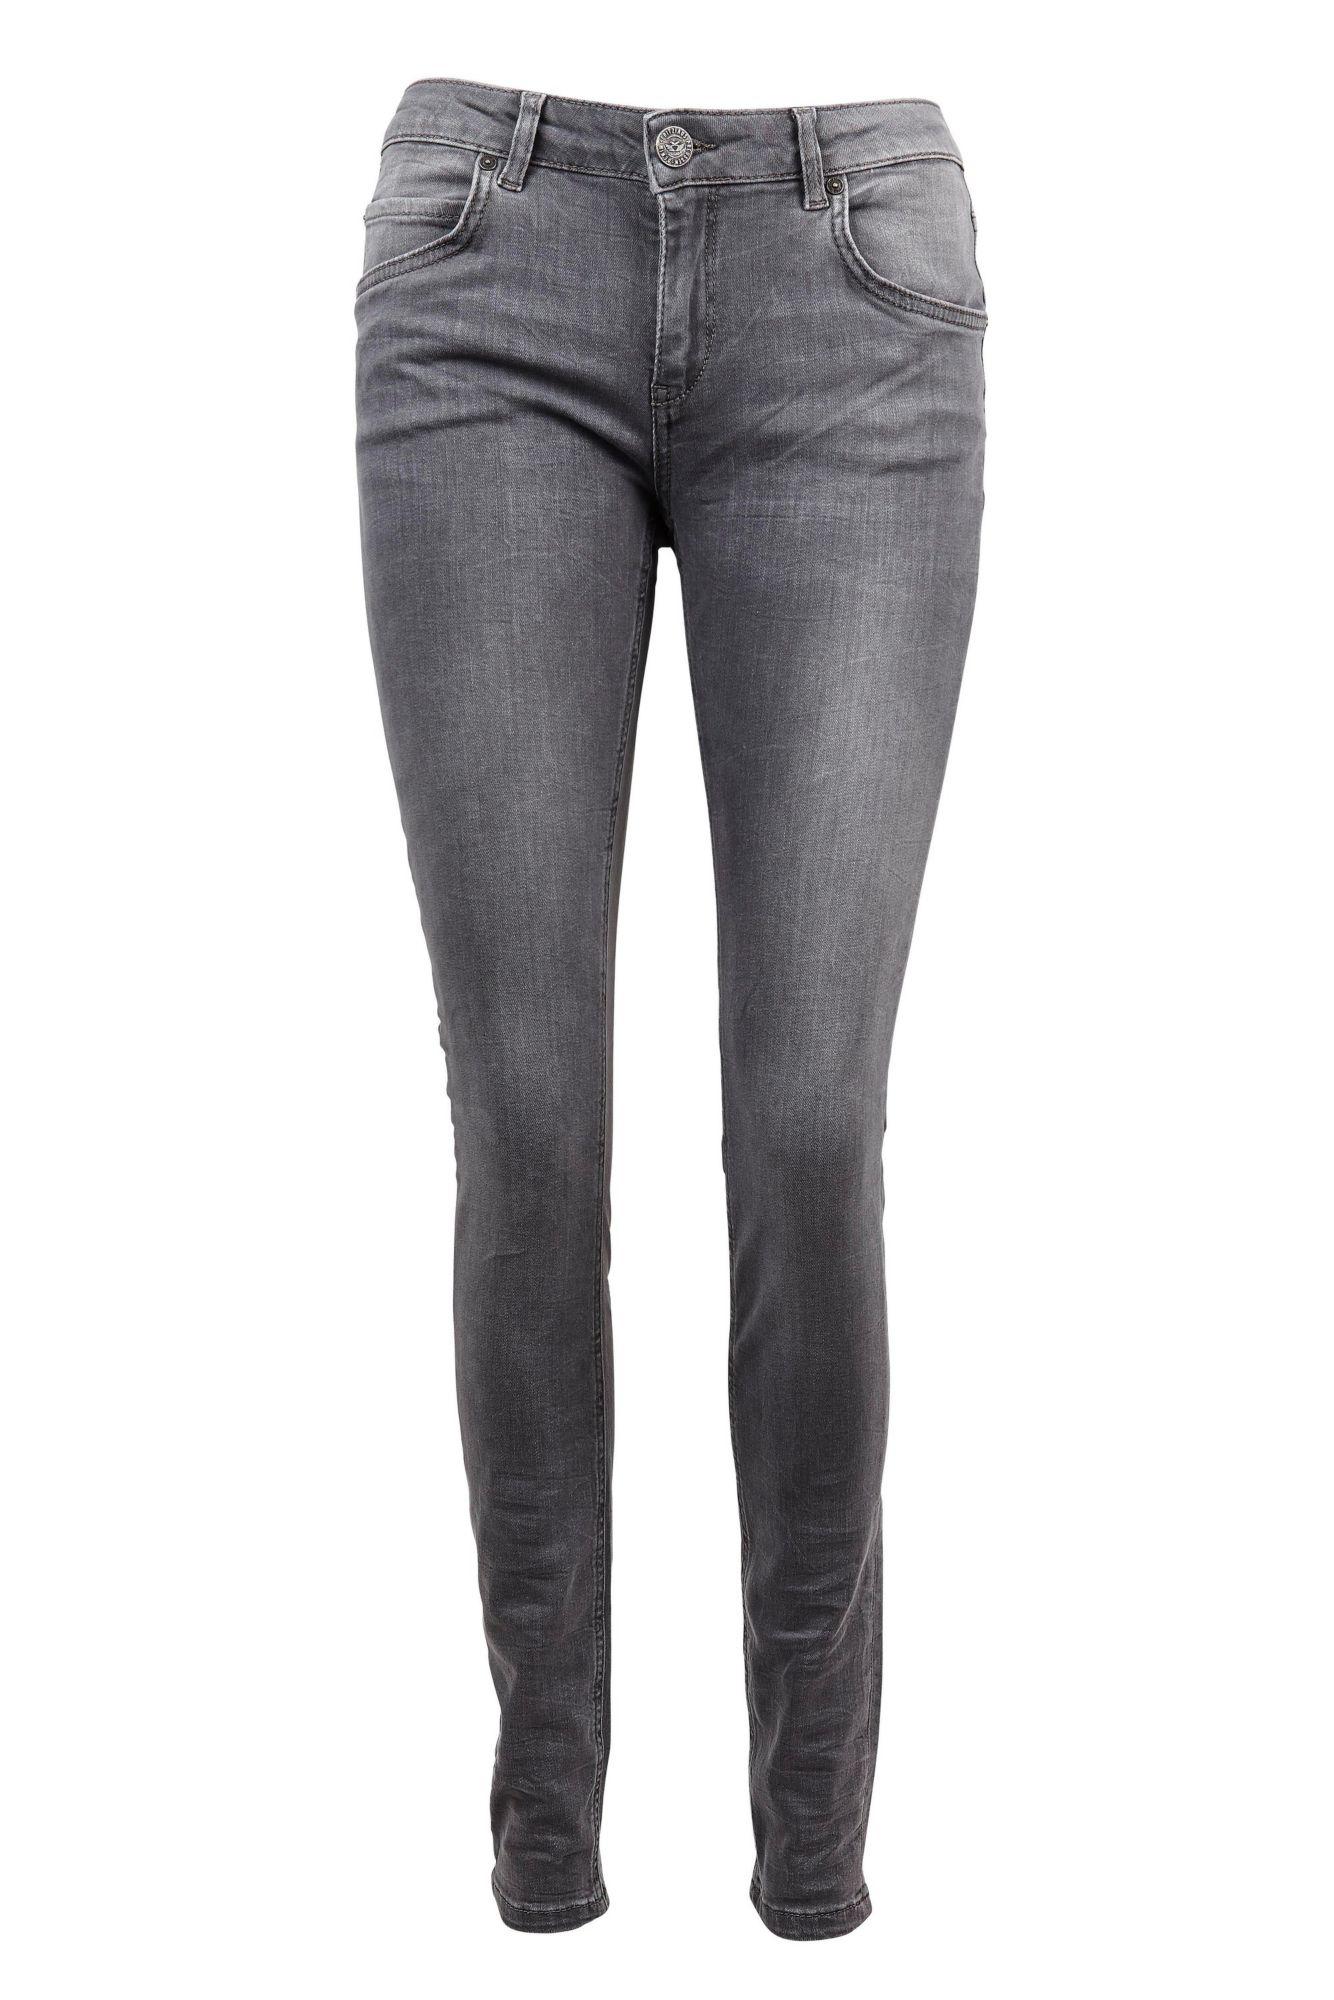 FRITZI AUS PREUSSEN Fritzi aus Preußen Jeans »Skinny Basic«